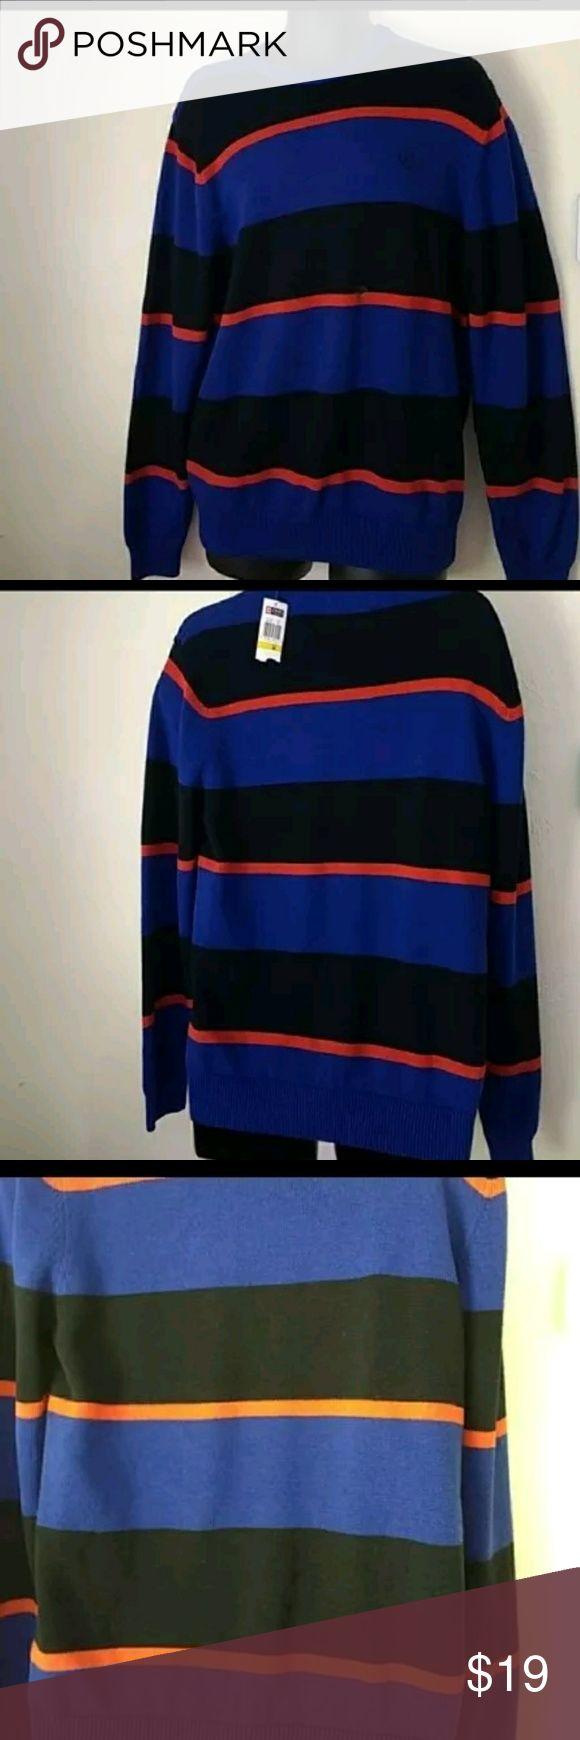 Chaps Ralph Lauren sweater new Striped brand new! Retail 69$ Chaps Sweaters Crewneck